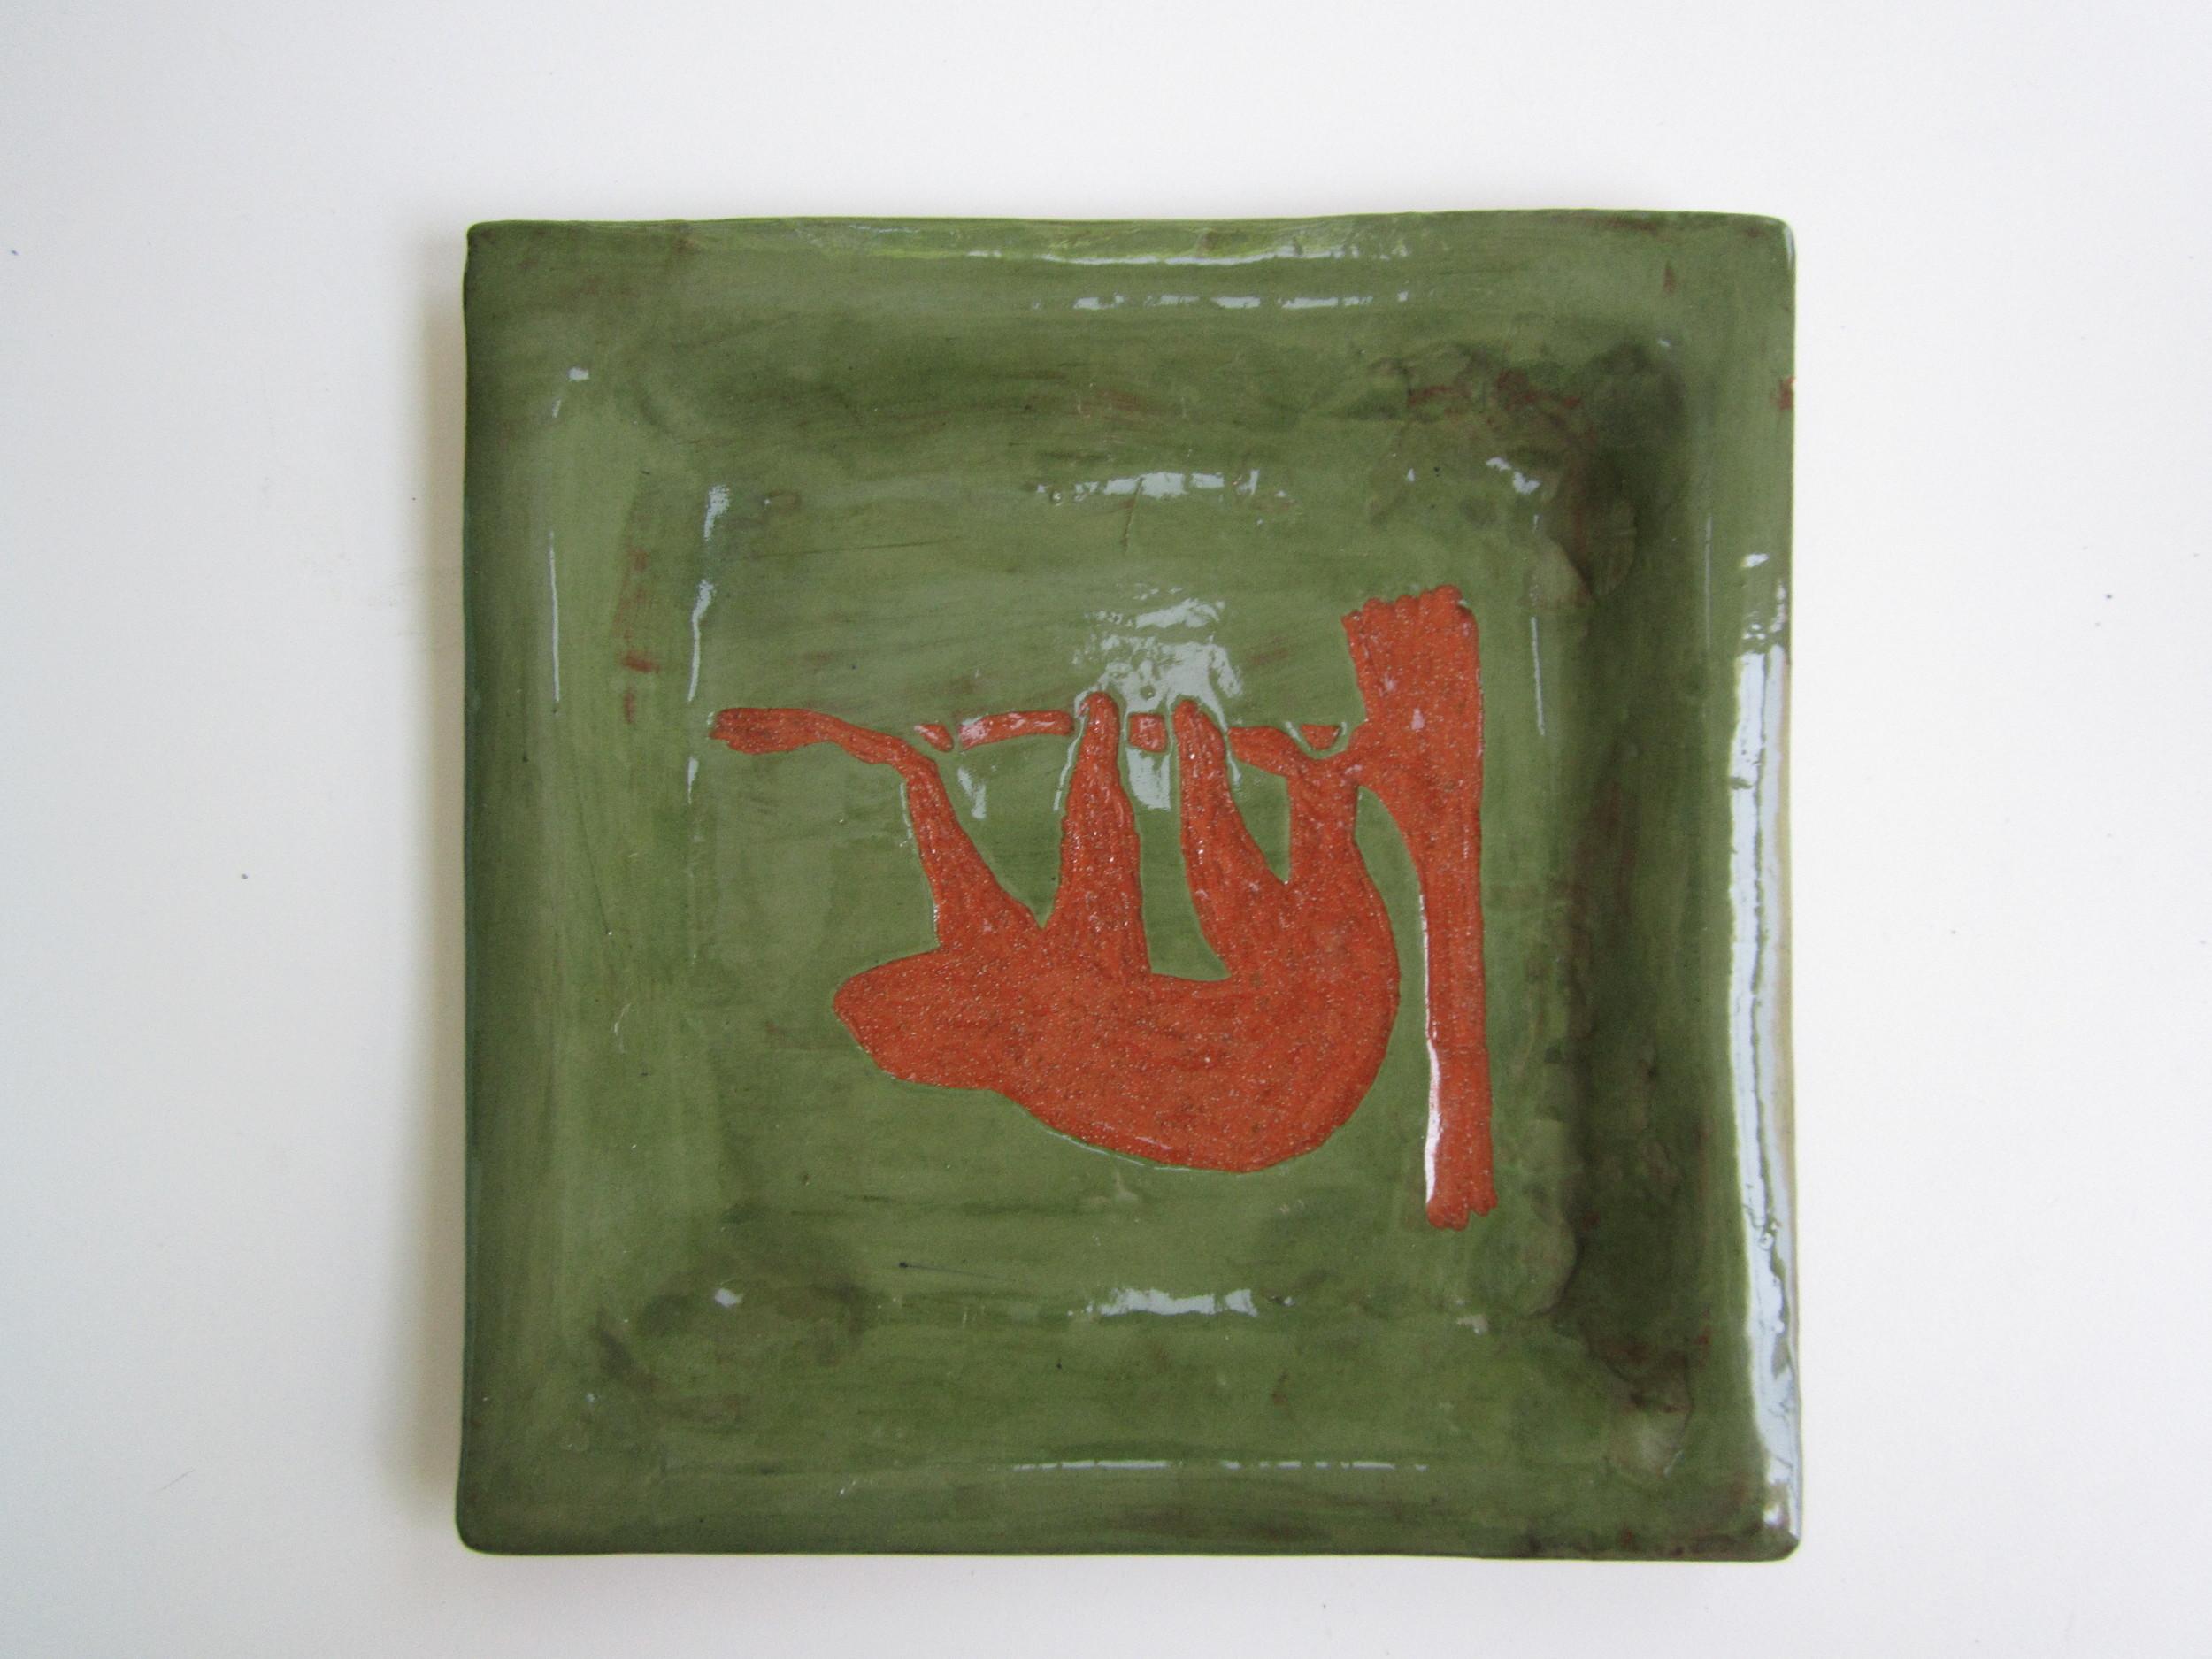 Green Sloth Plate 1.JPG